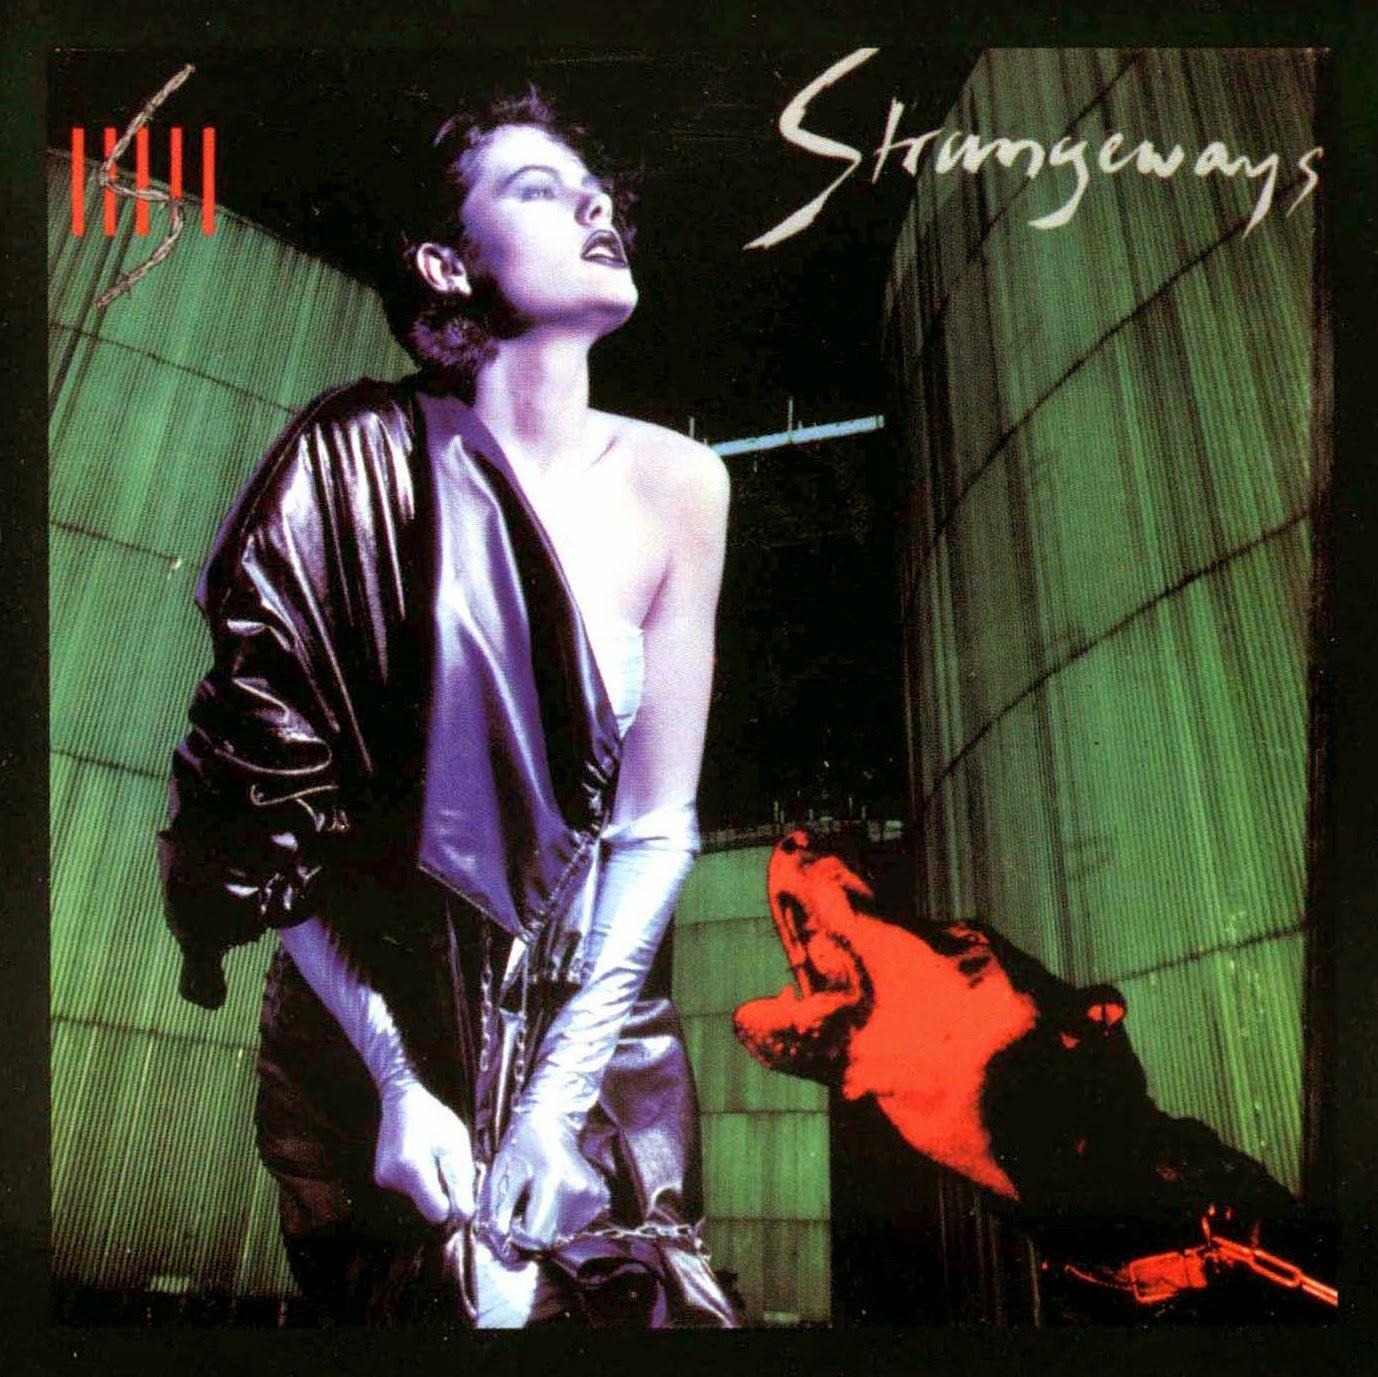 Strangeways st 1984 aor melodic rock